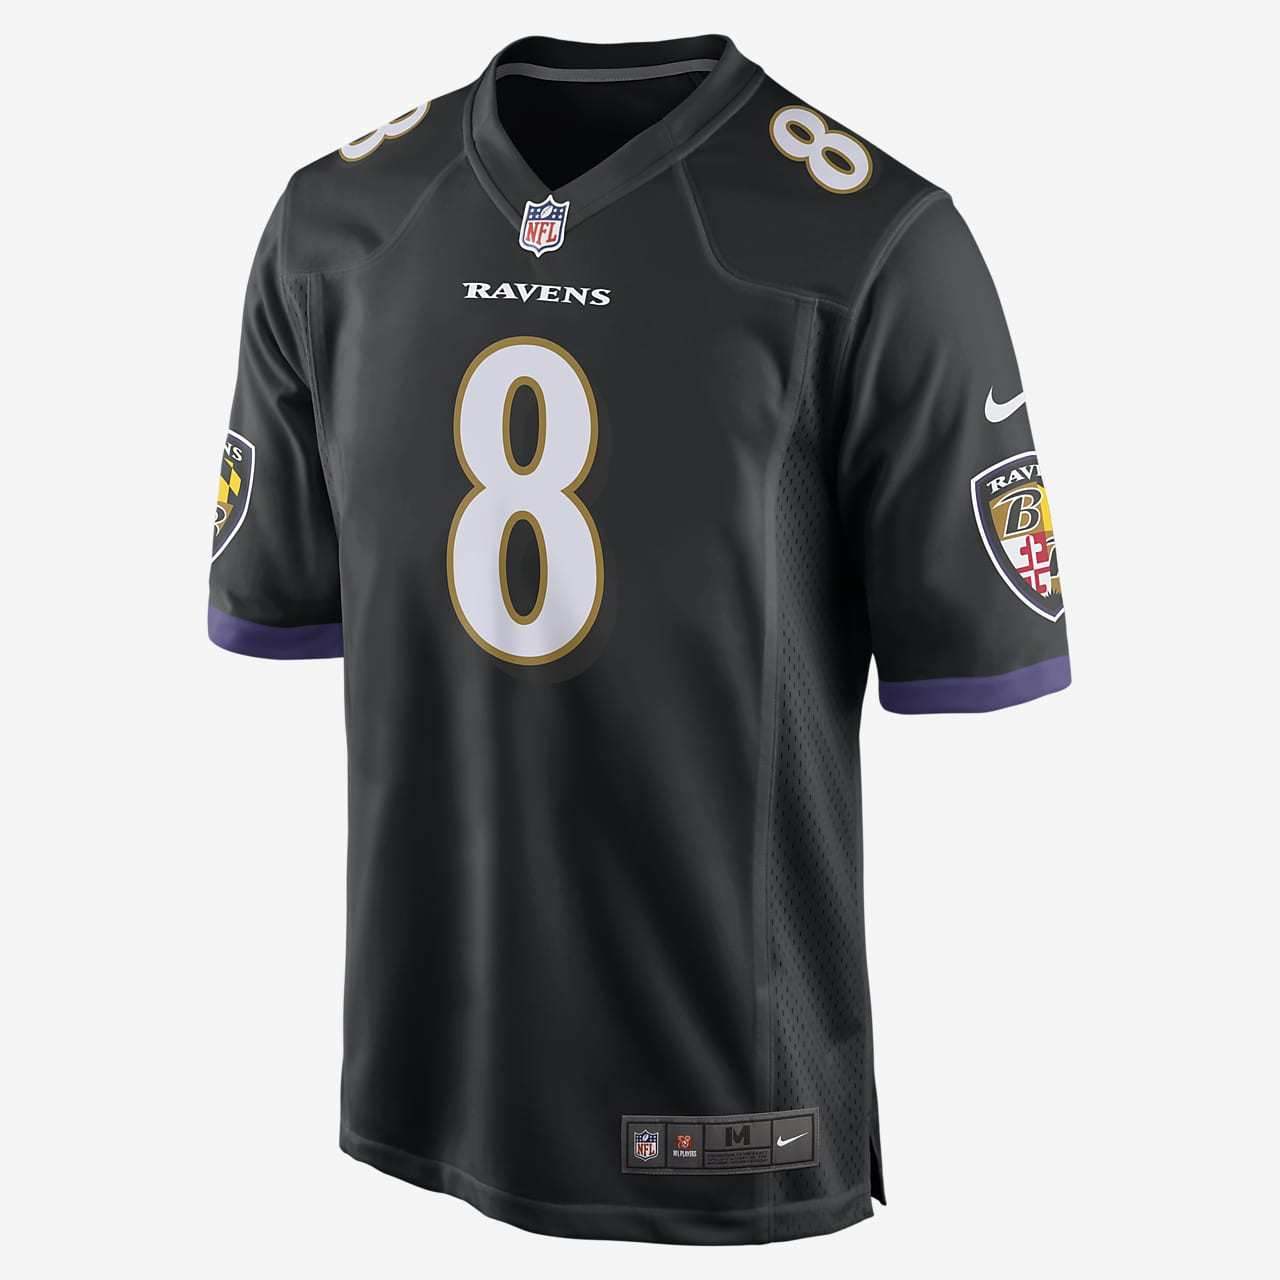 buy ravens jersey